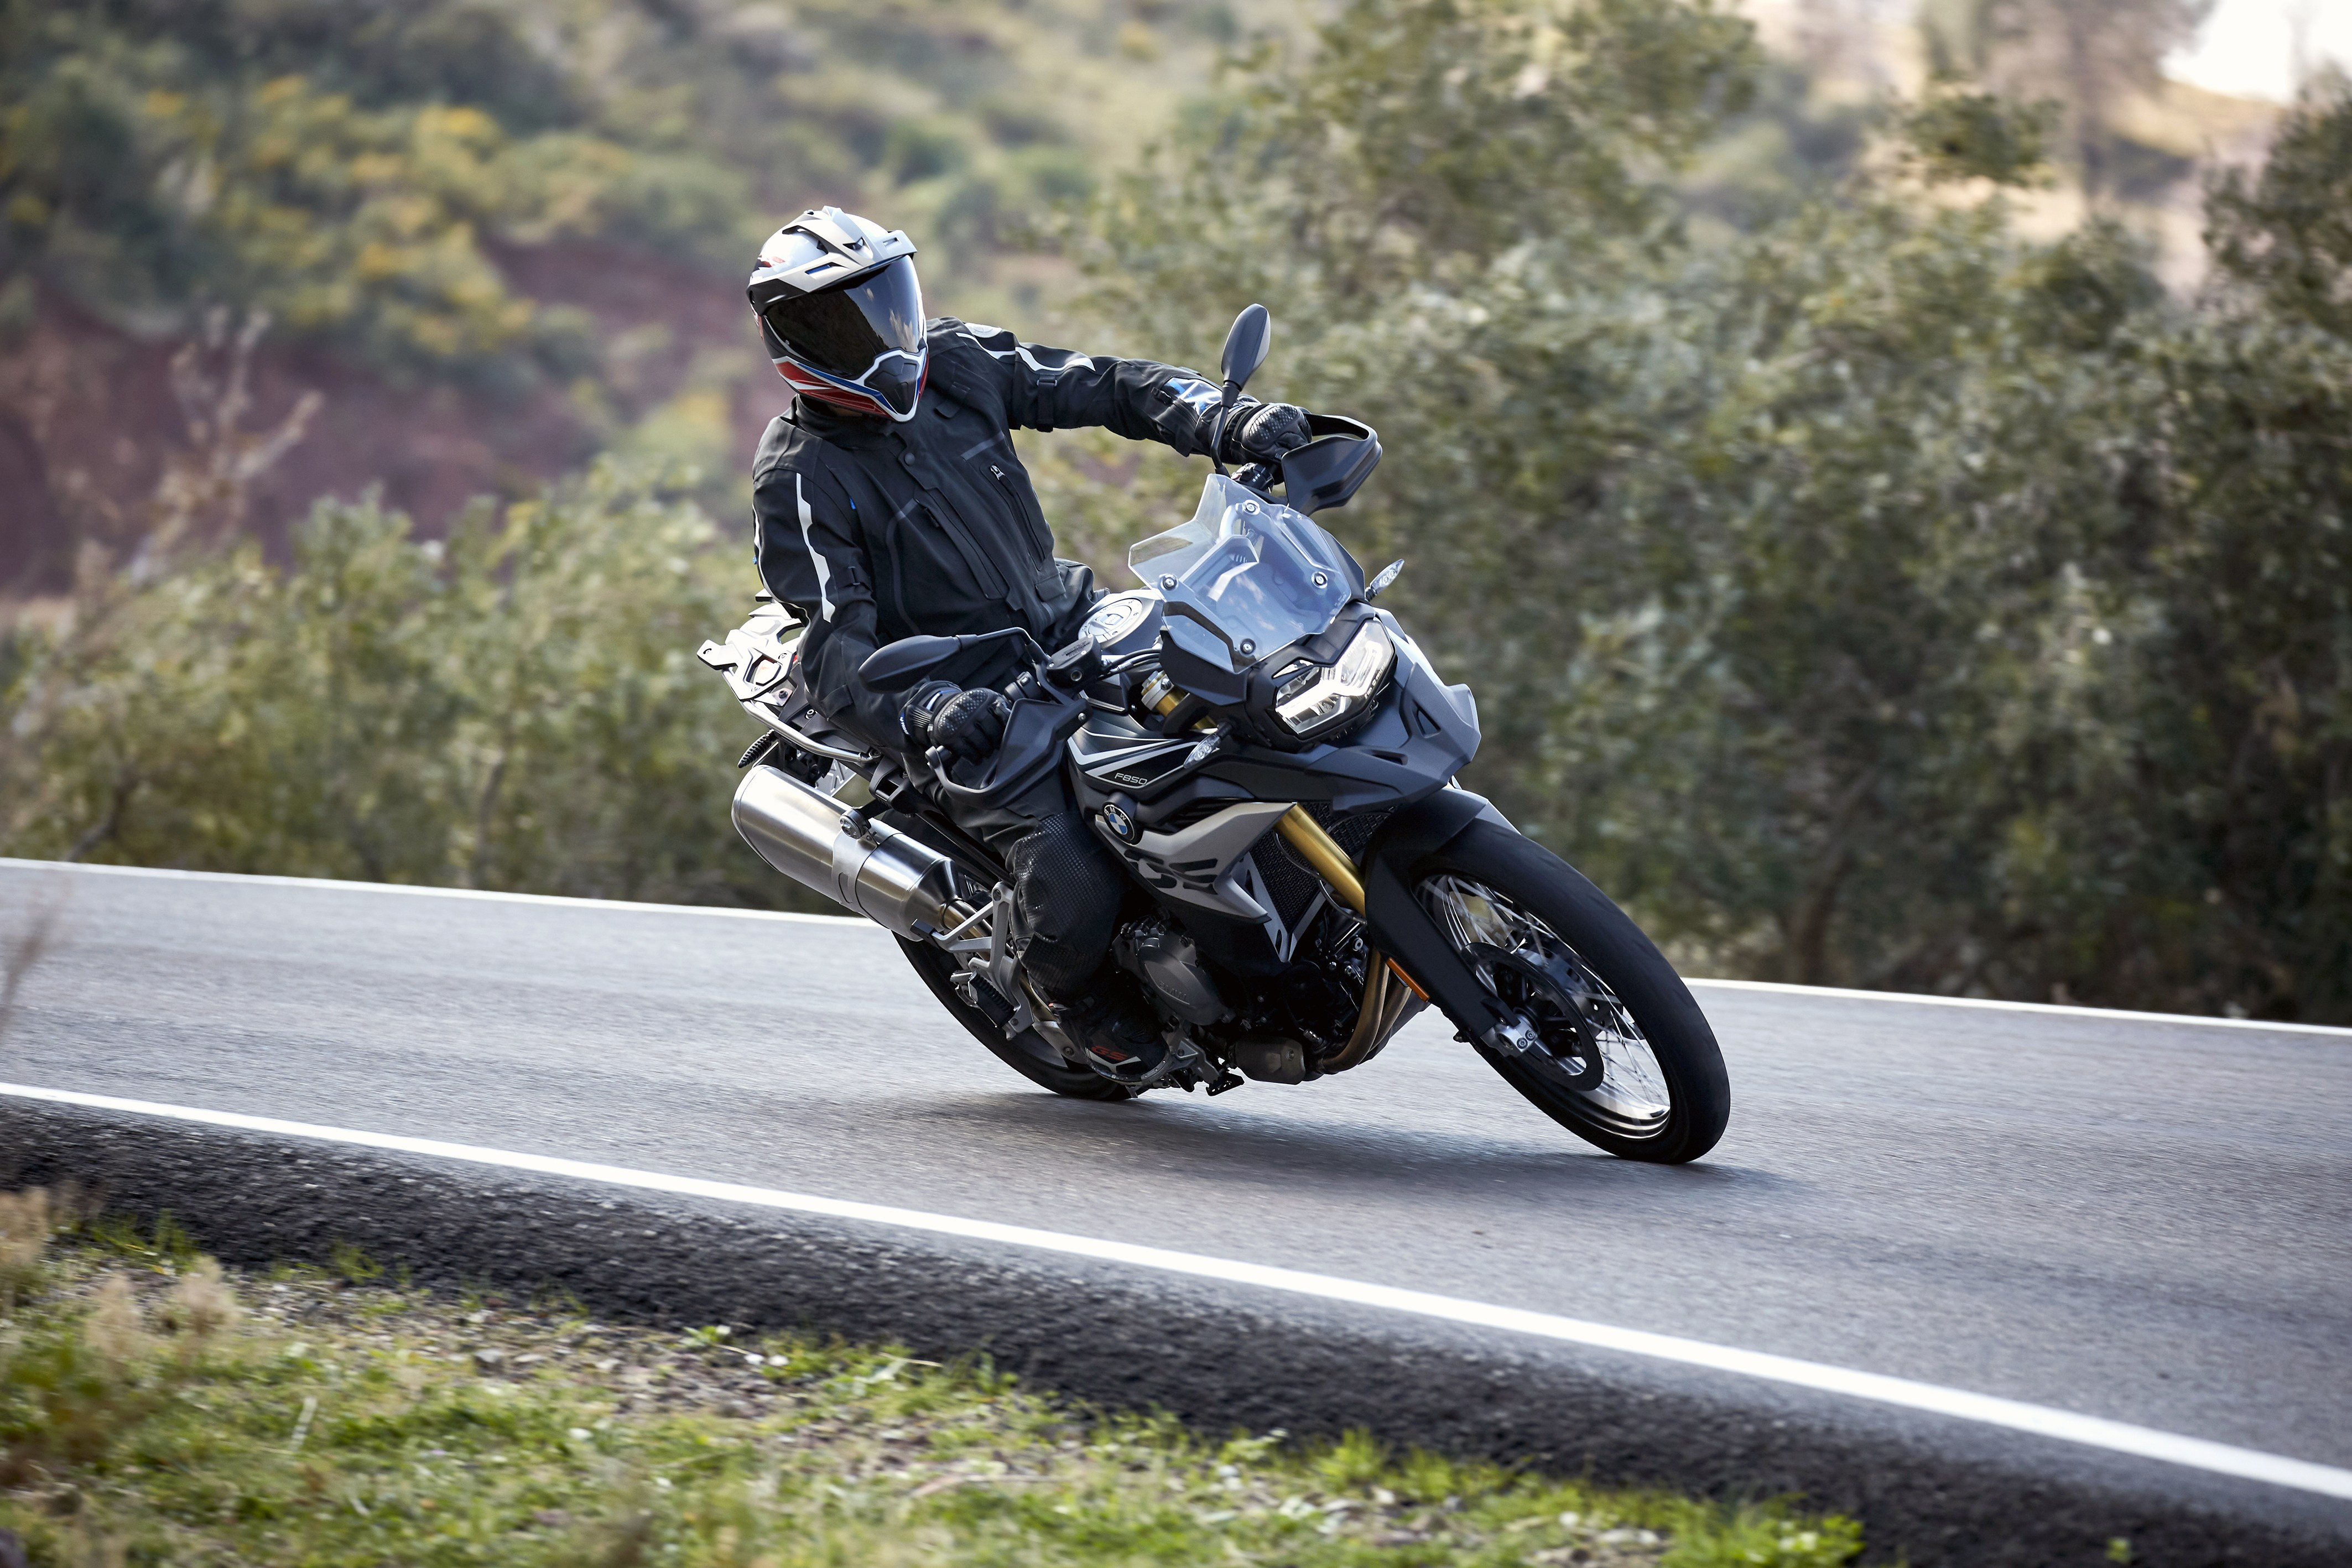 BMW Motorrad: Τα ξεχωριστά μοντέλα της Σειράς F